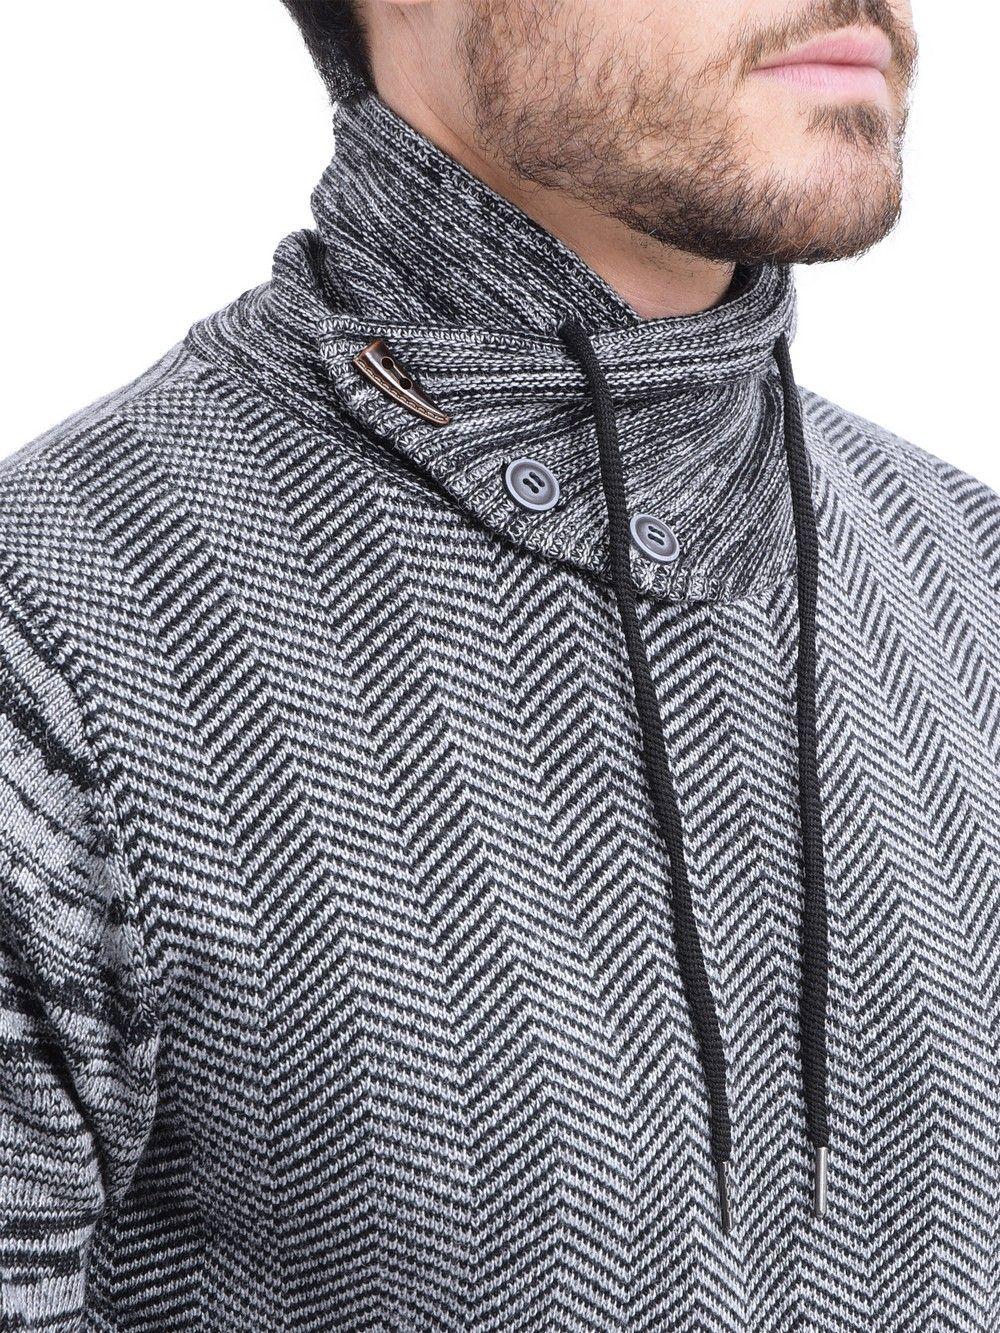 C&JO Shawl Collar Jacquard Sweater with Cords in Black